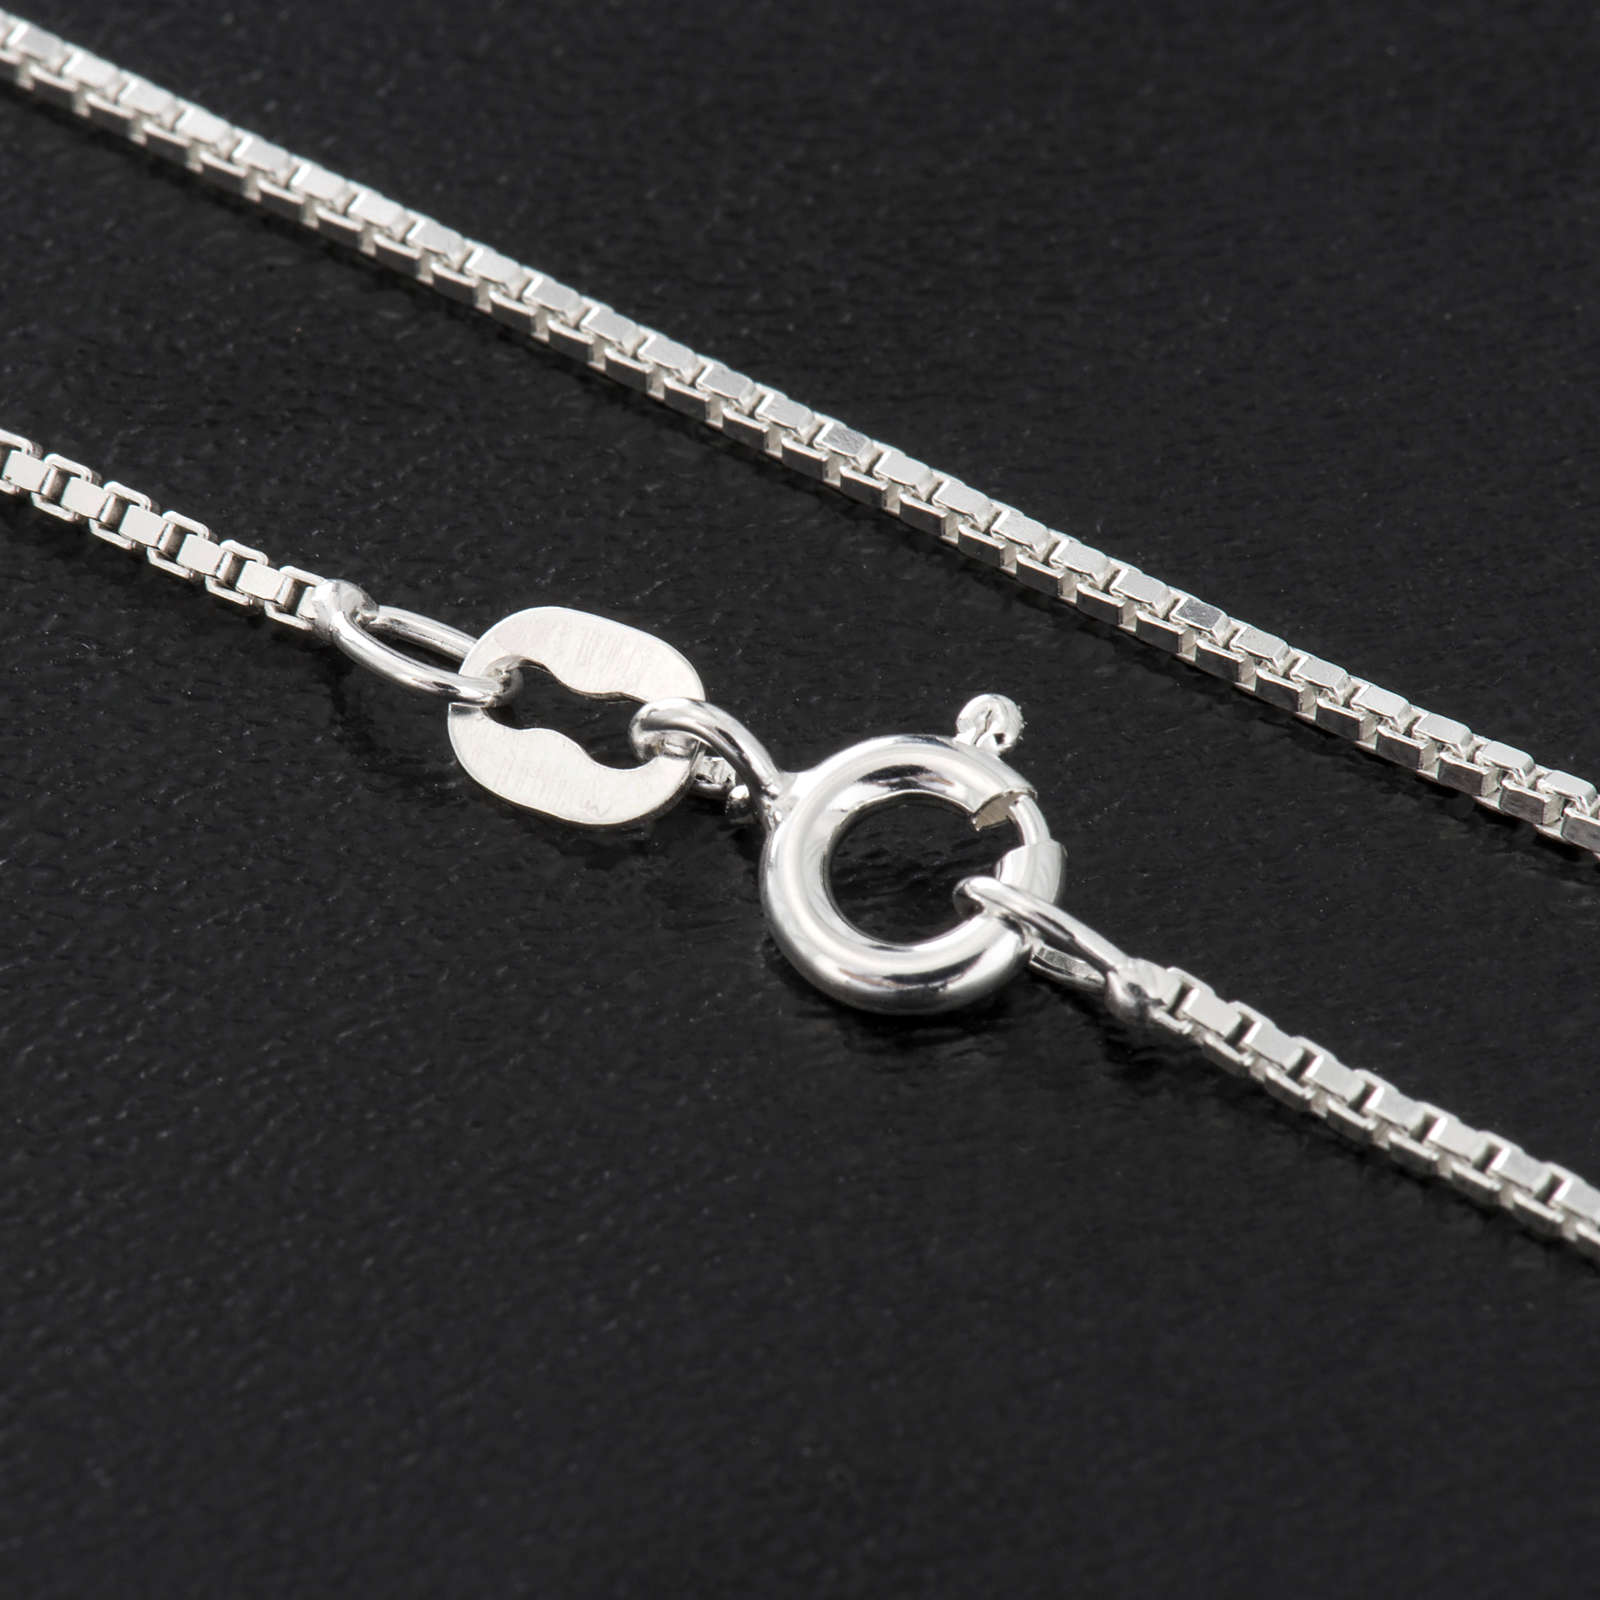 Corrente Veneziana prata 925 radiada comprimento 60 cm 4